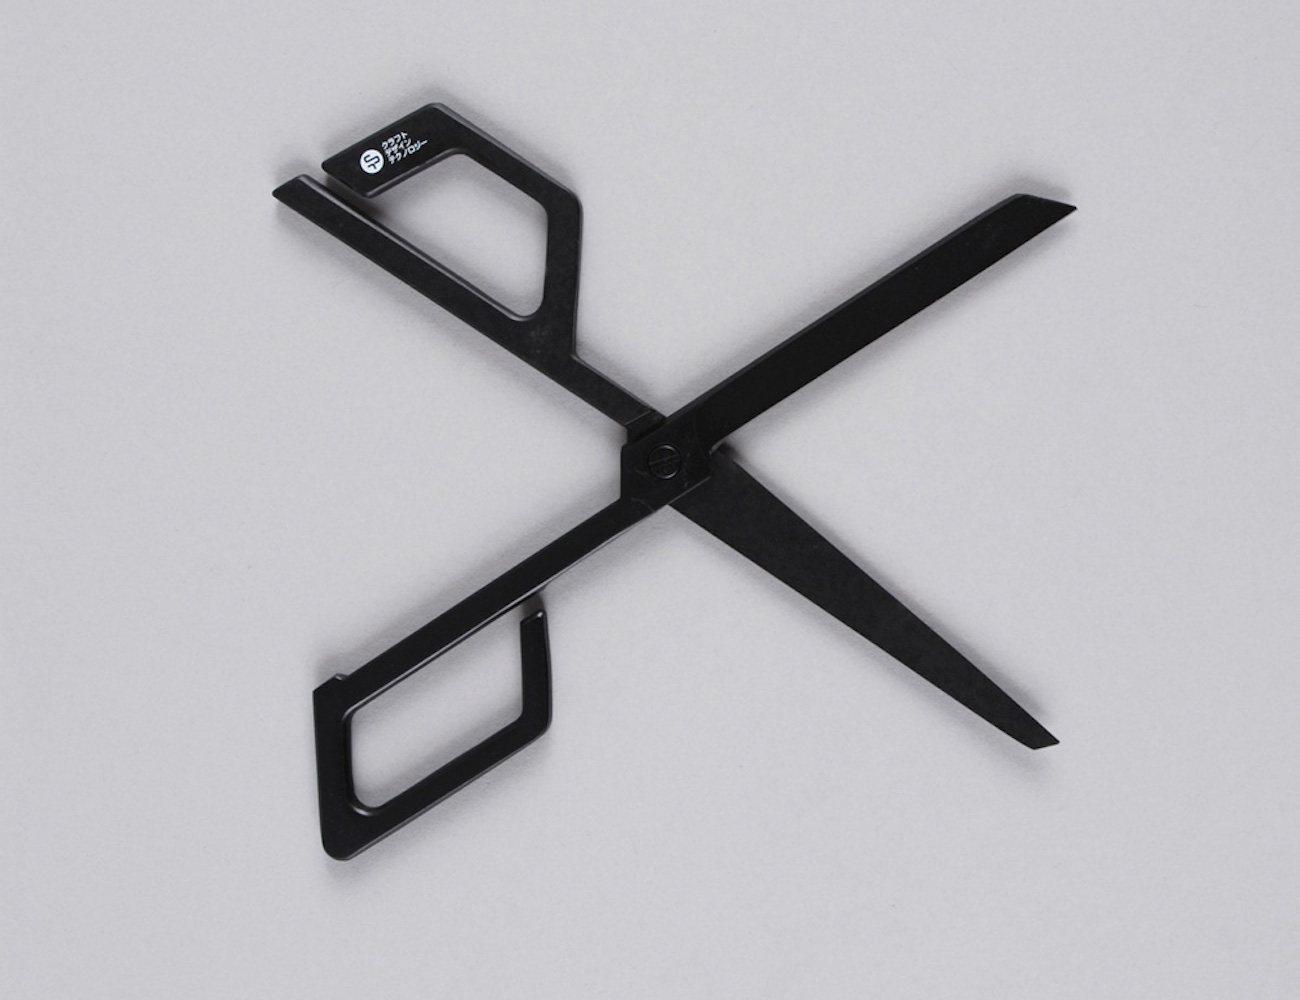 Black Scissors By Craft Design Technology Gadget Flow